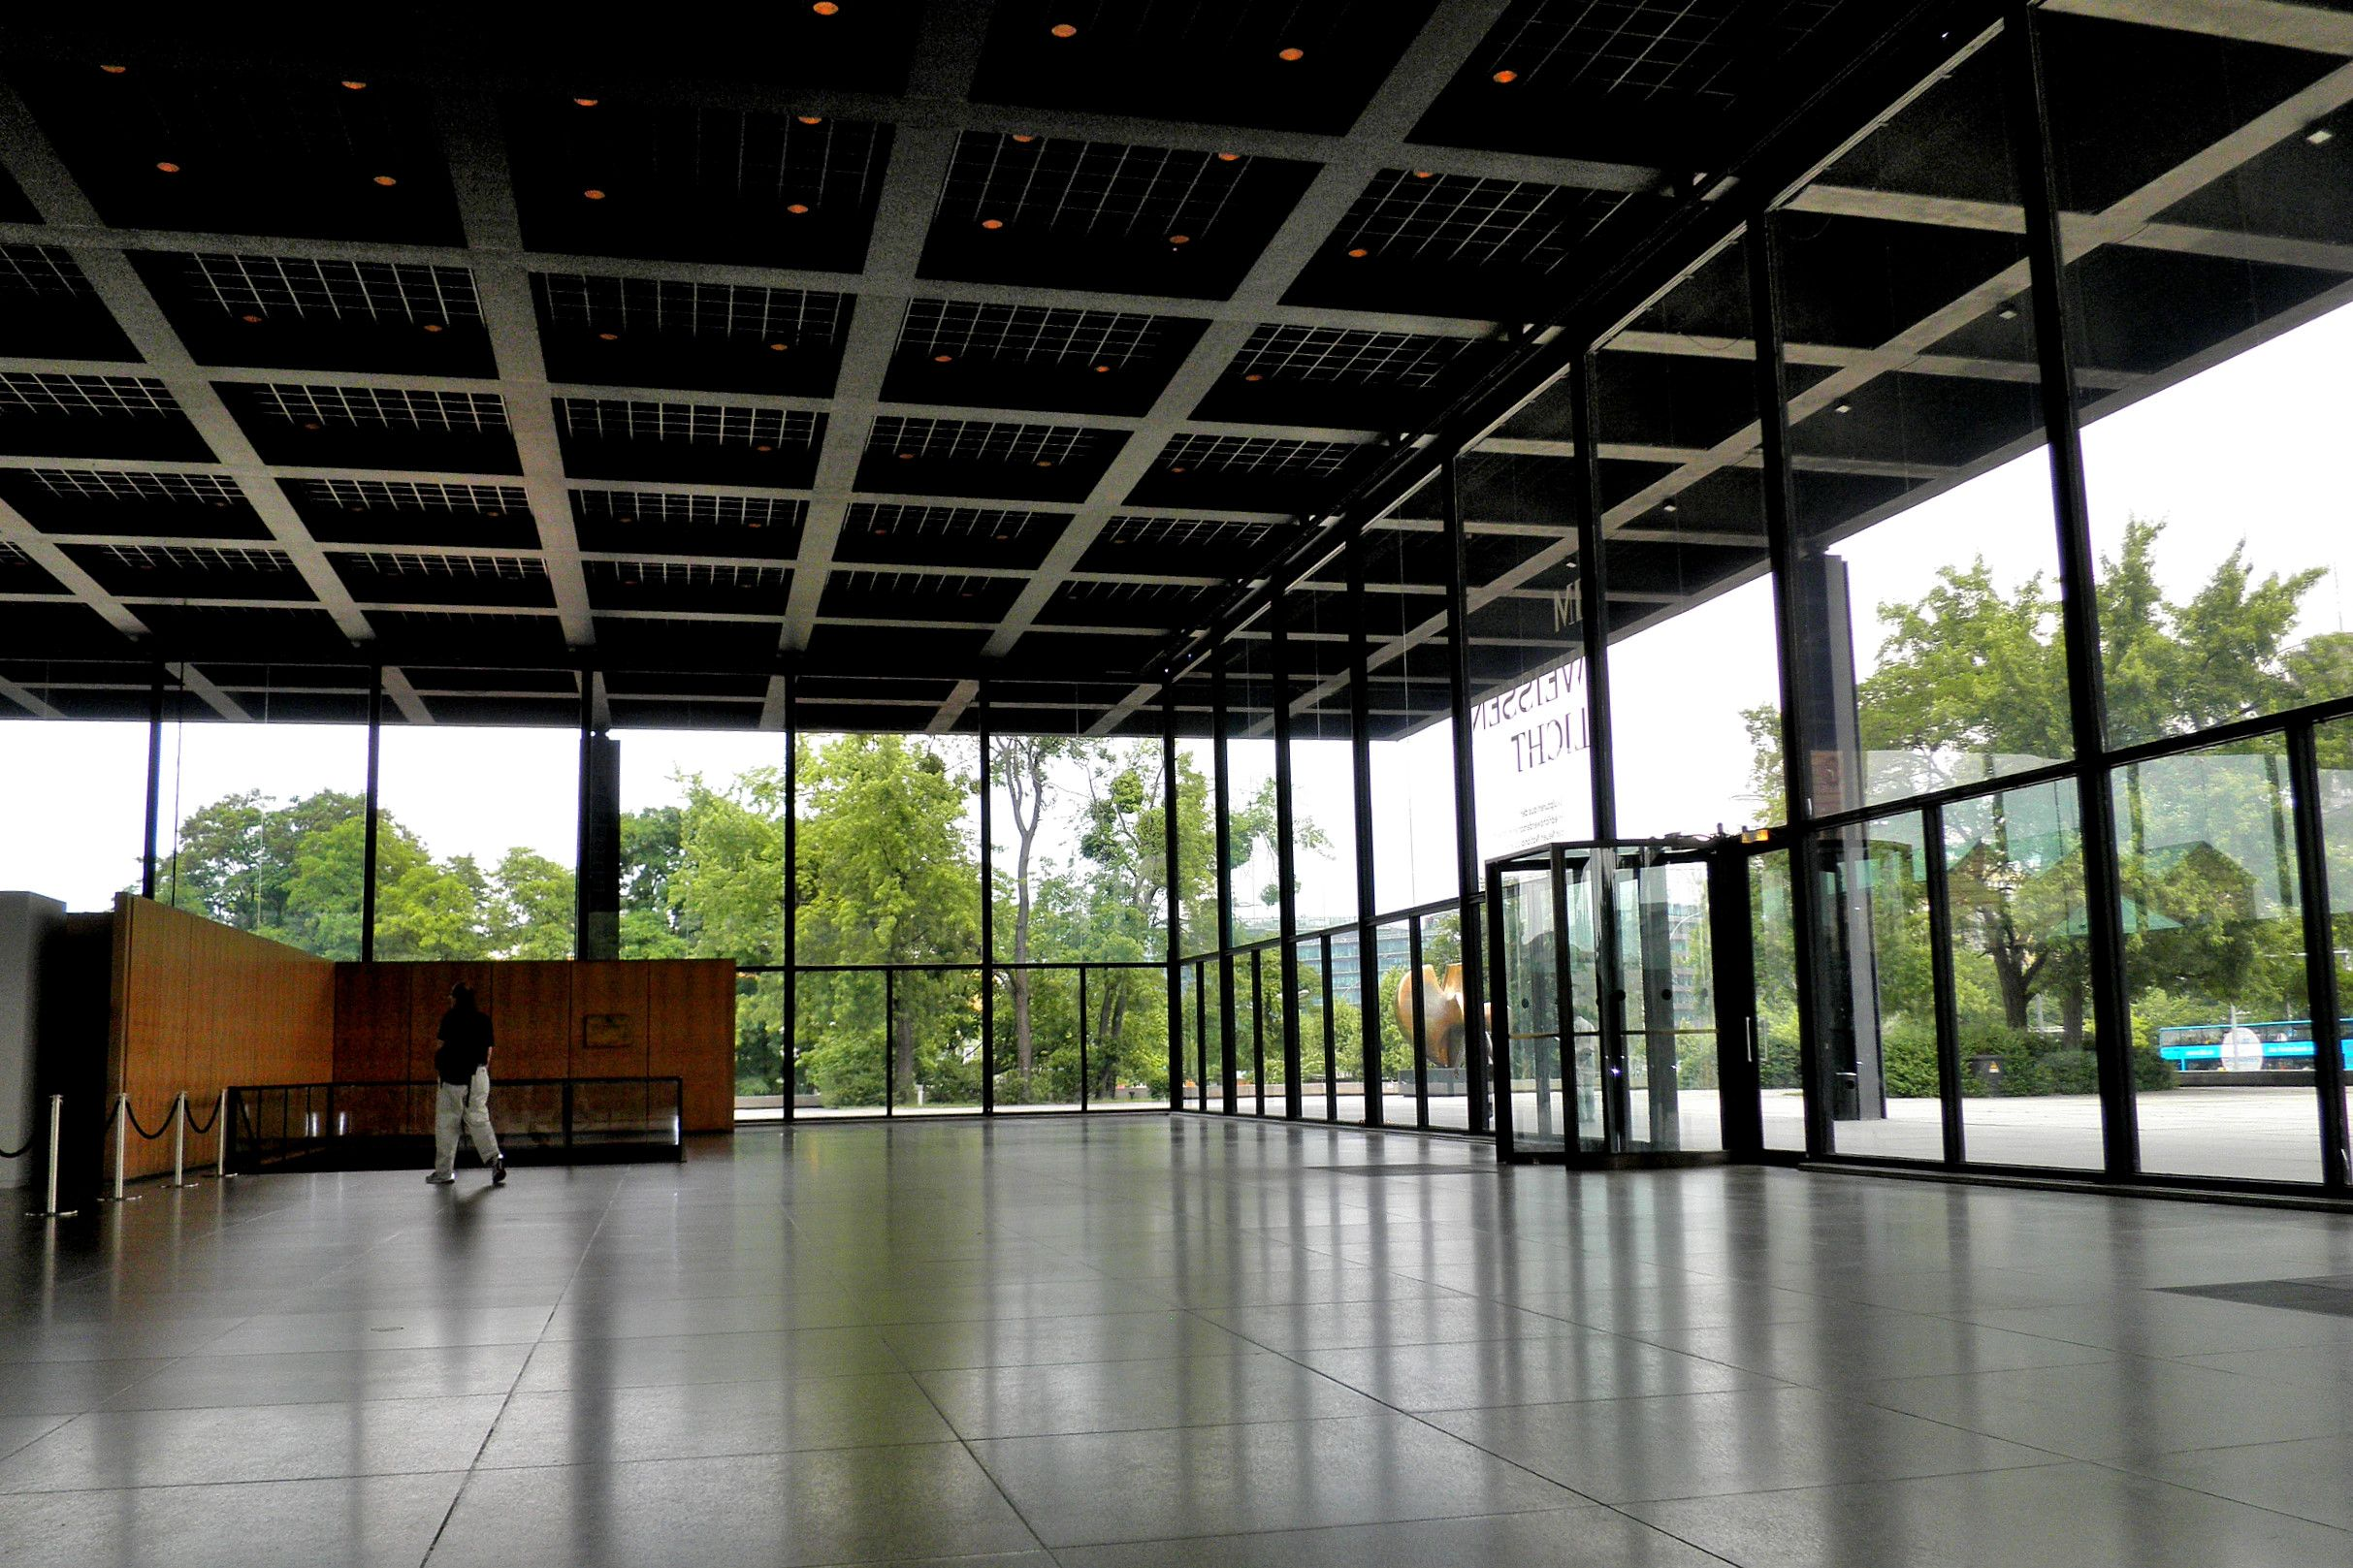 Mies van der Rohe; Neue Nationalgalerie, Berlin, 1962-68 ...